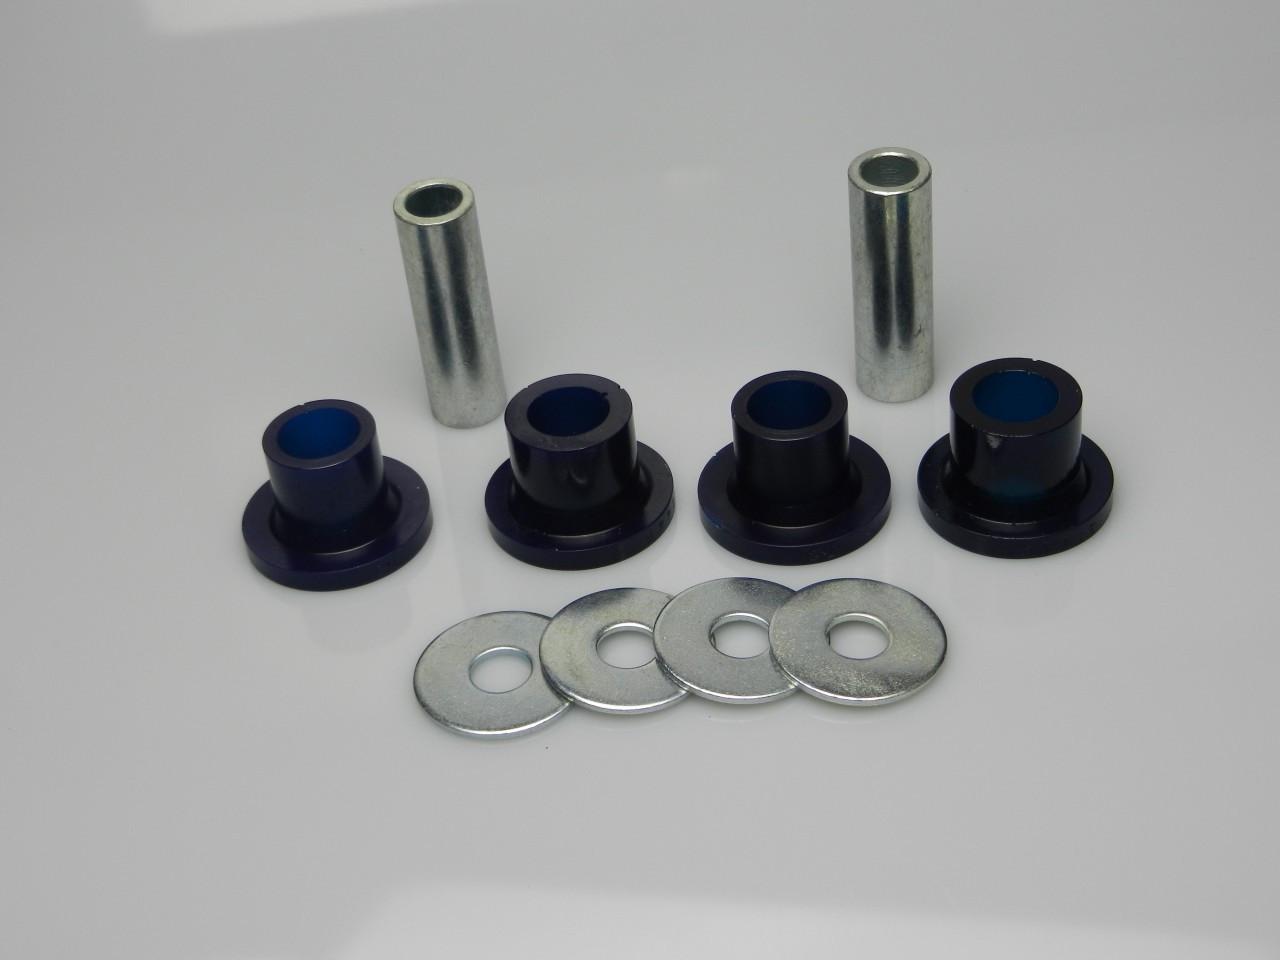 New Power Steering Rack Mounting Kit for Toyota Prado 120 Series 1/03–8/09